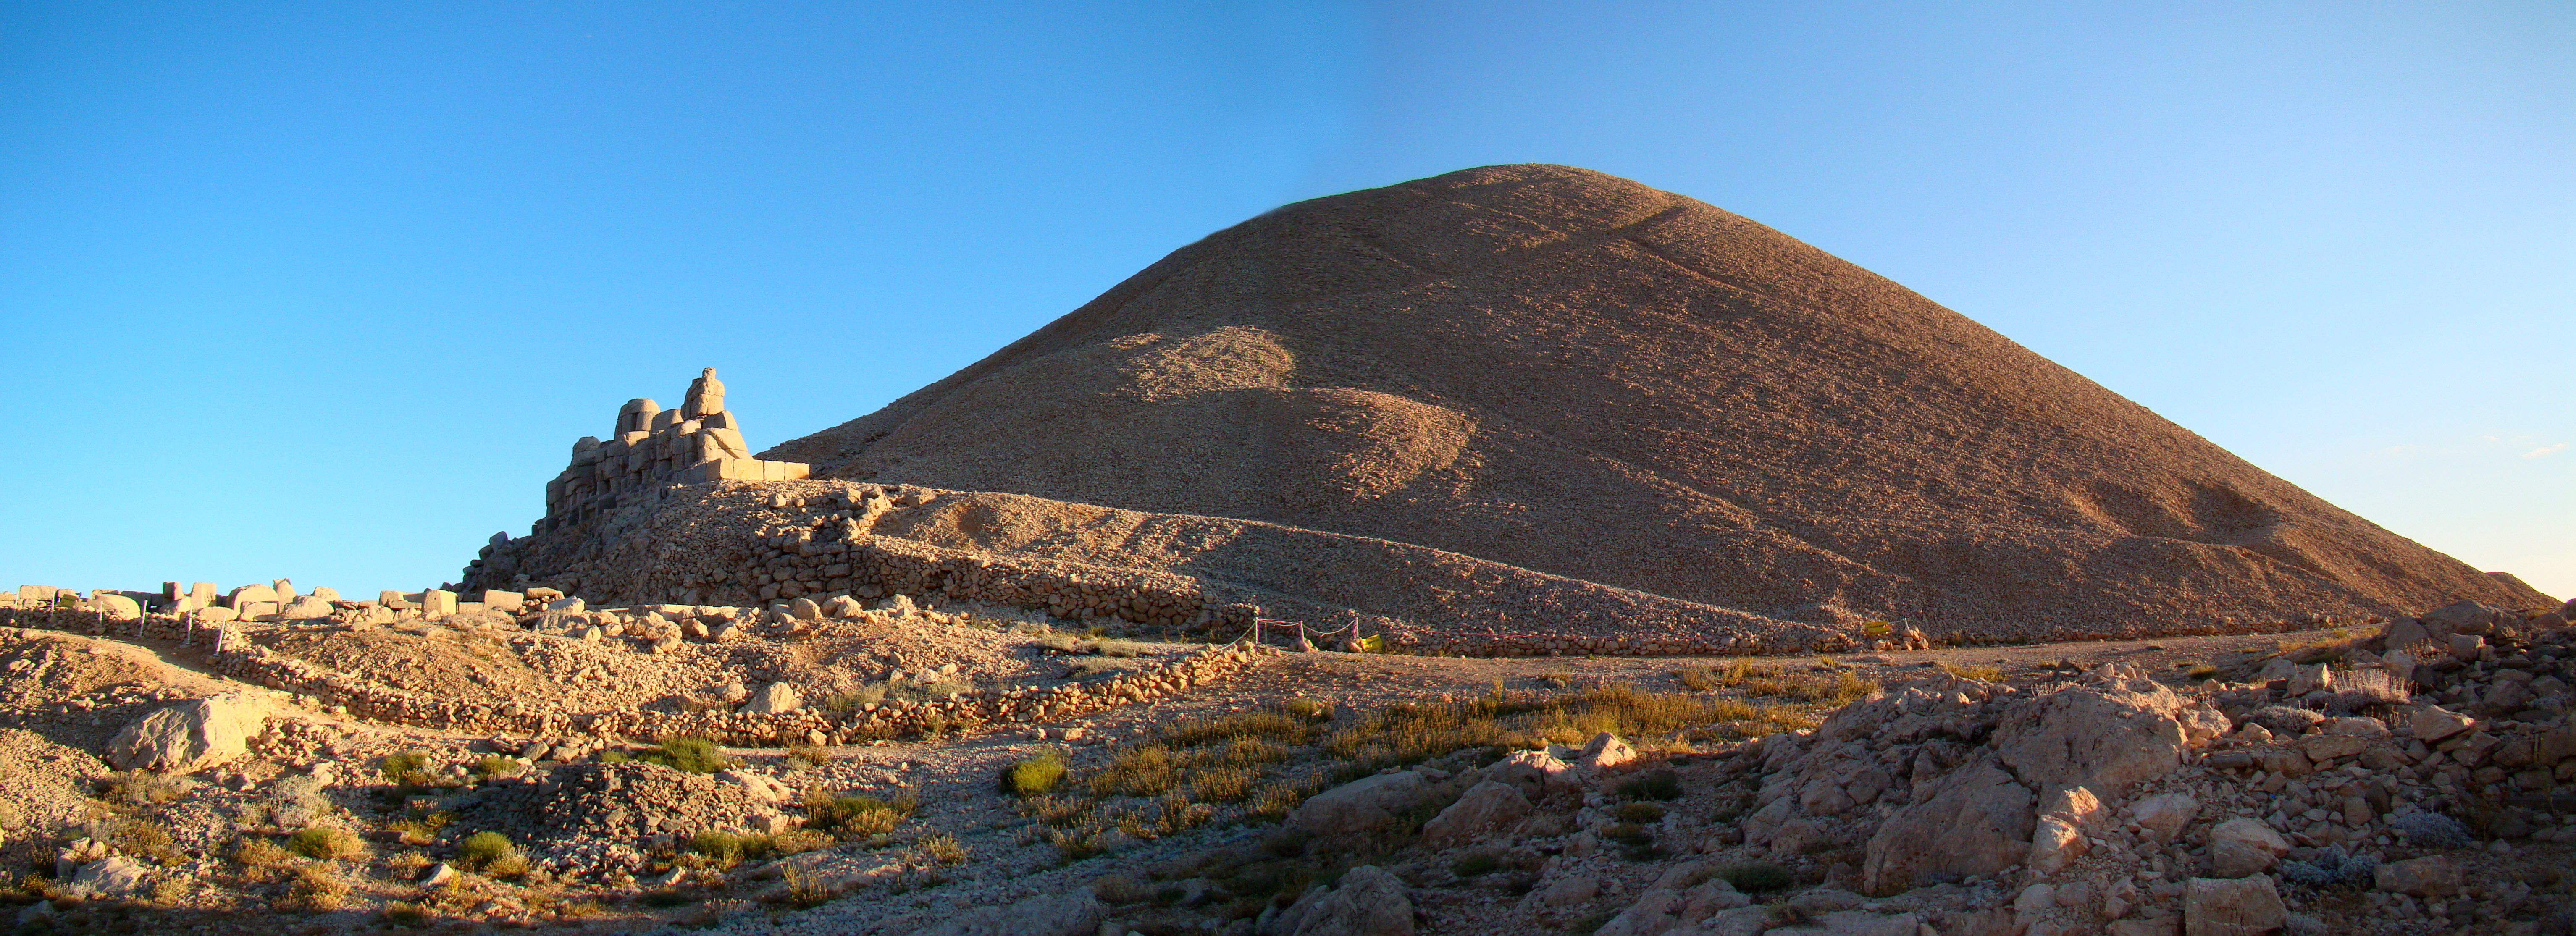 Mount Nemrut - Wikipedia